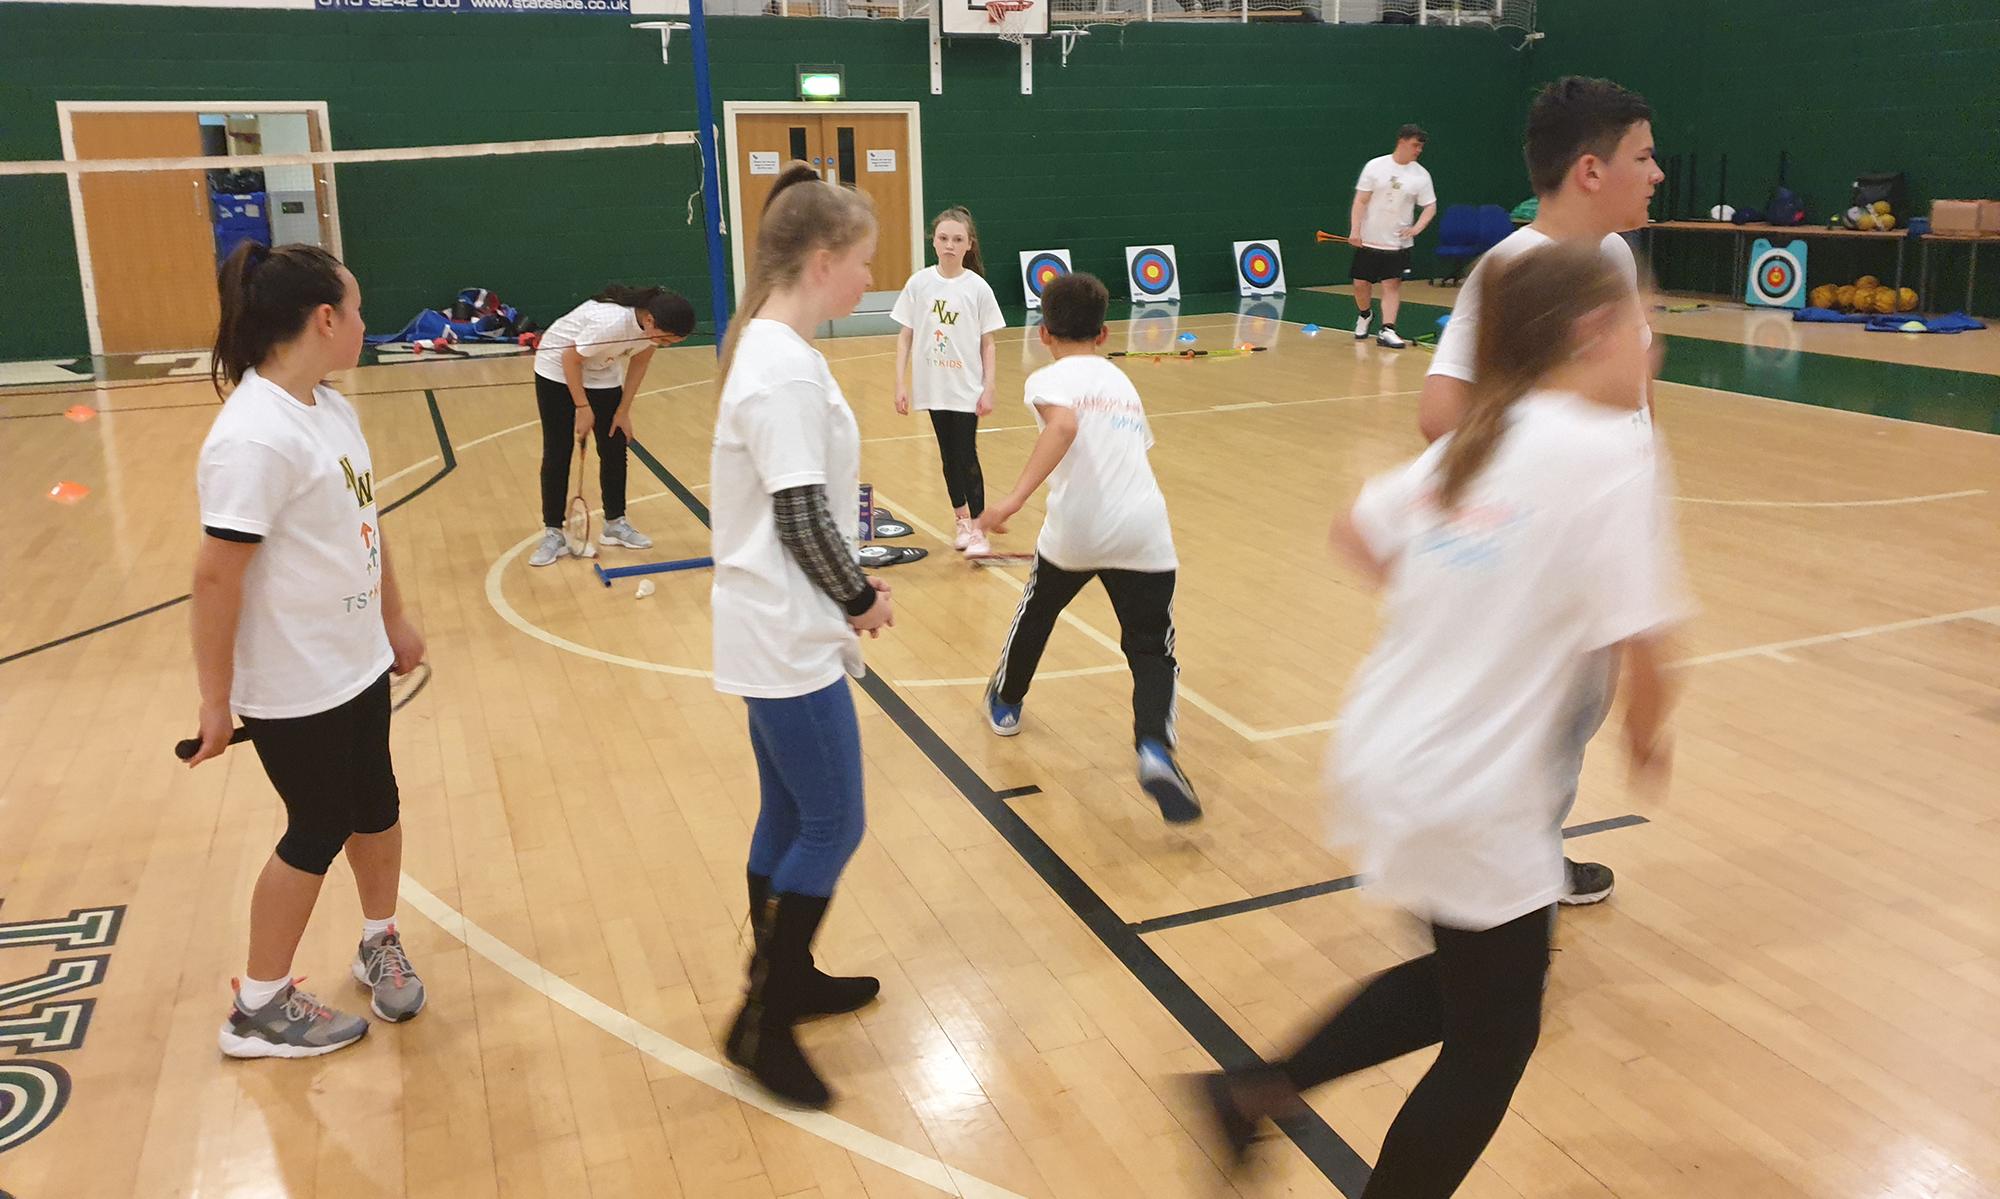 TS Kids & Teens Sports Activity Session at Warwick – January 4, 2020